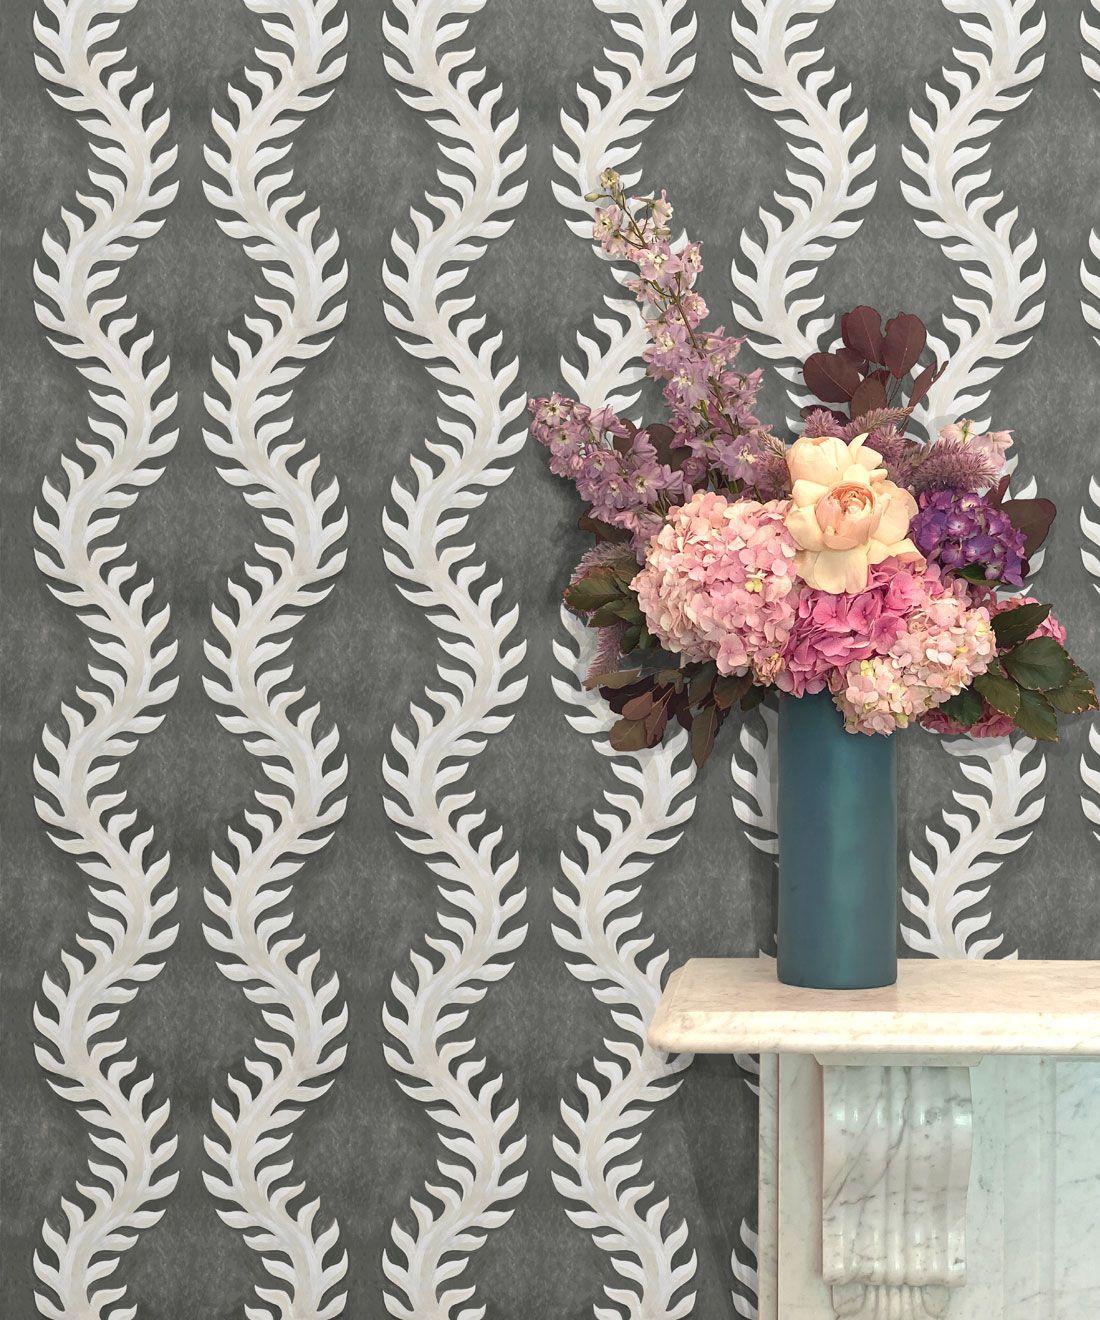 Fern Wallpaper • Gray Wallpaper •Insitu with pink flowers